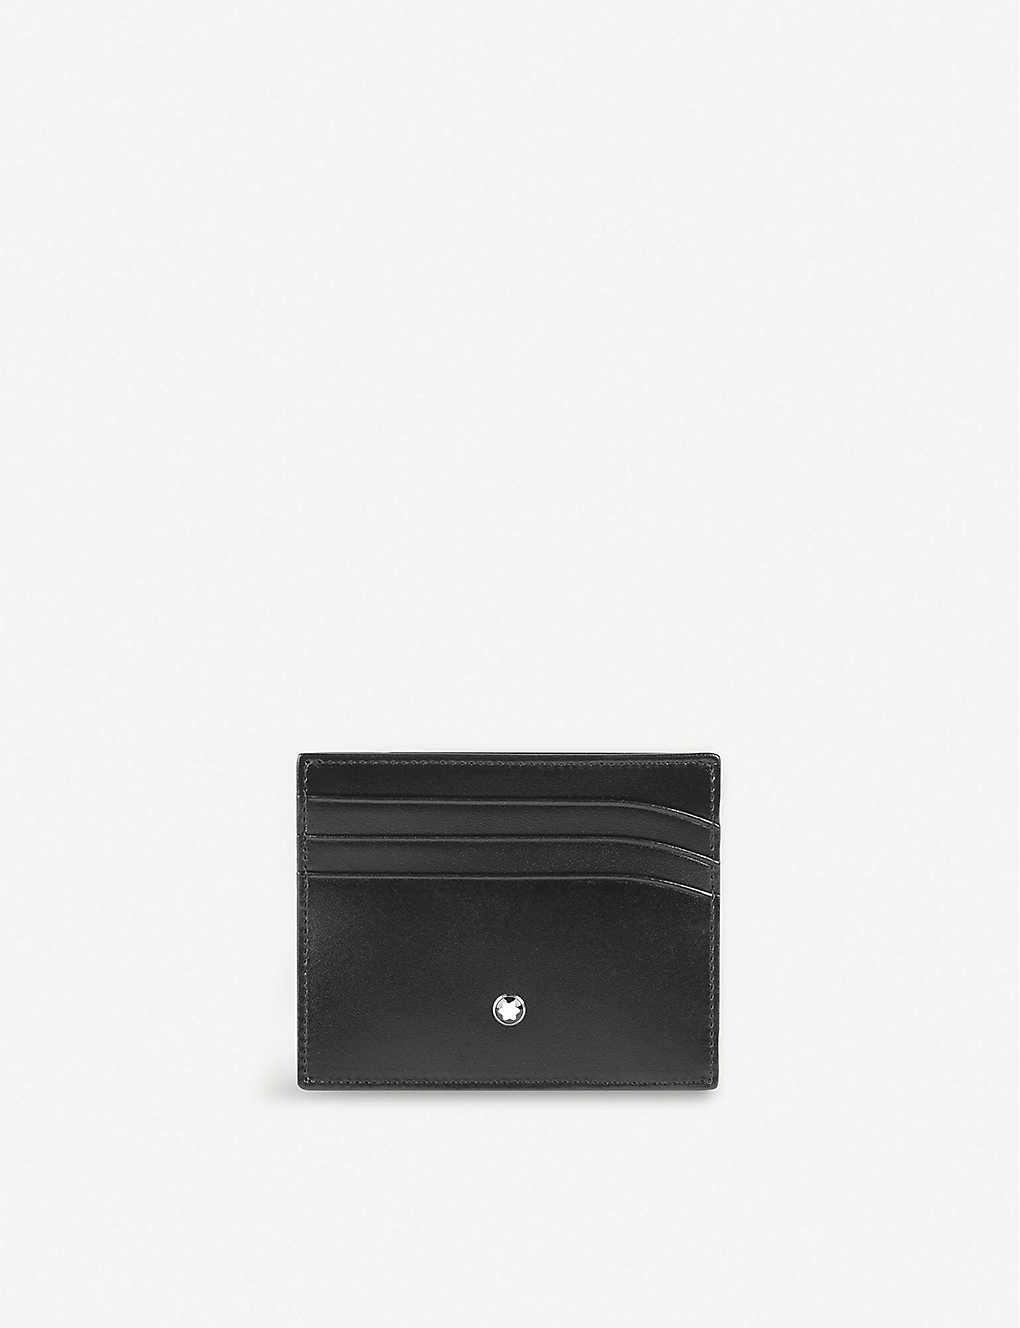 60bbf9836f20b MONTBLANC - Meisterstück leather 6cc credit card holder | Selfridges.com